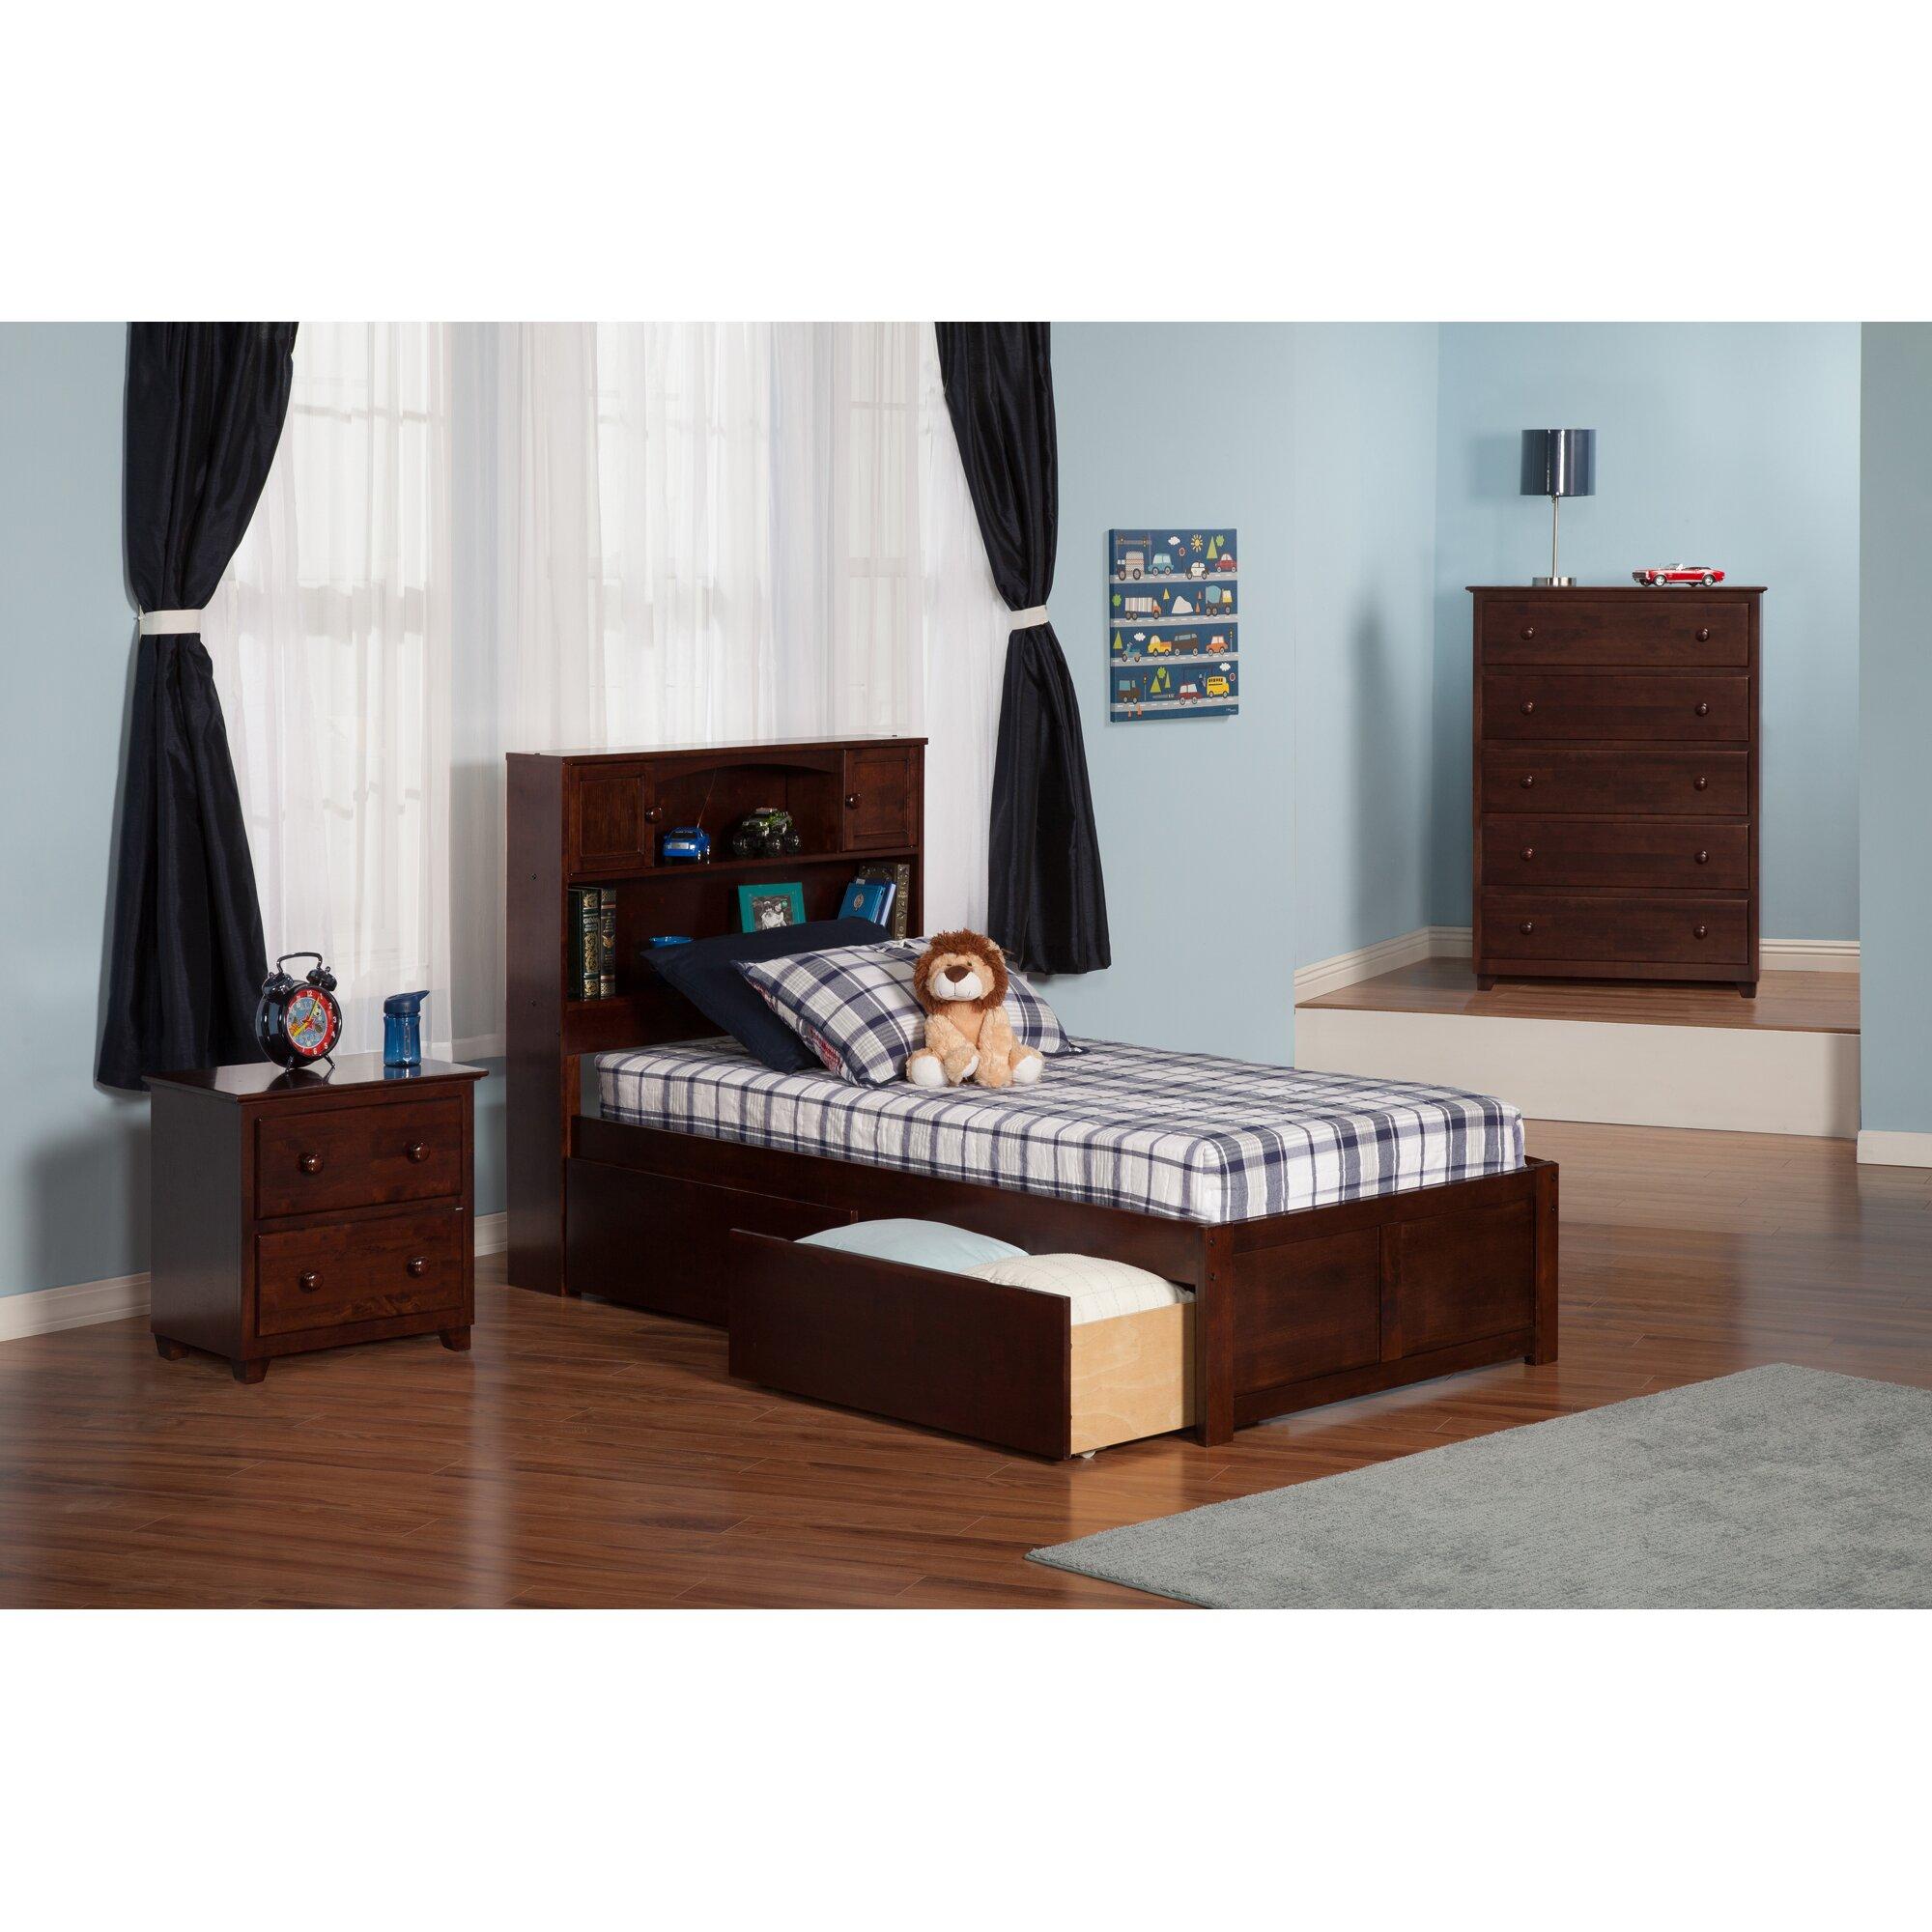 Warefair Com: Atlantic Furniture Newport Extra Long Twin Platform Bed